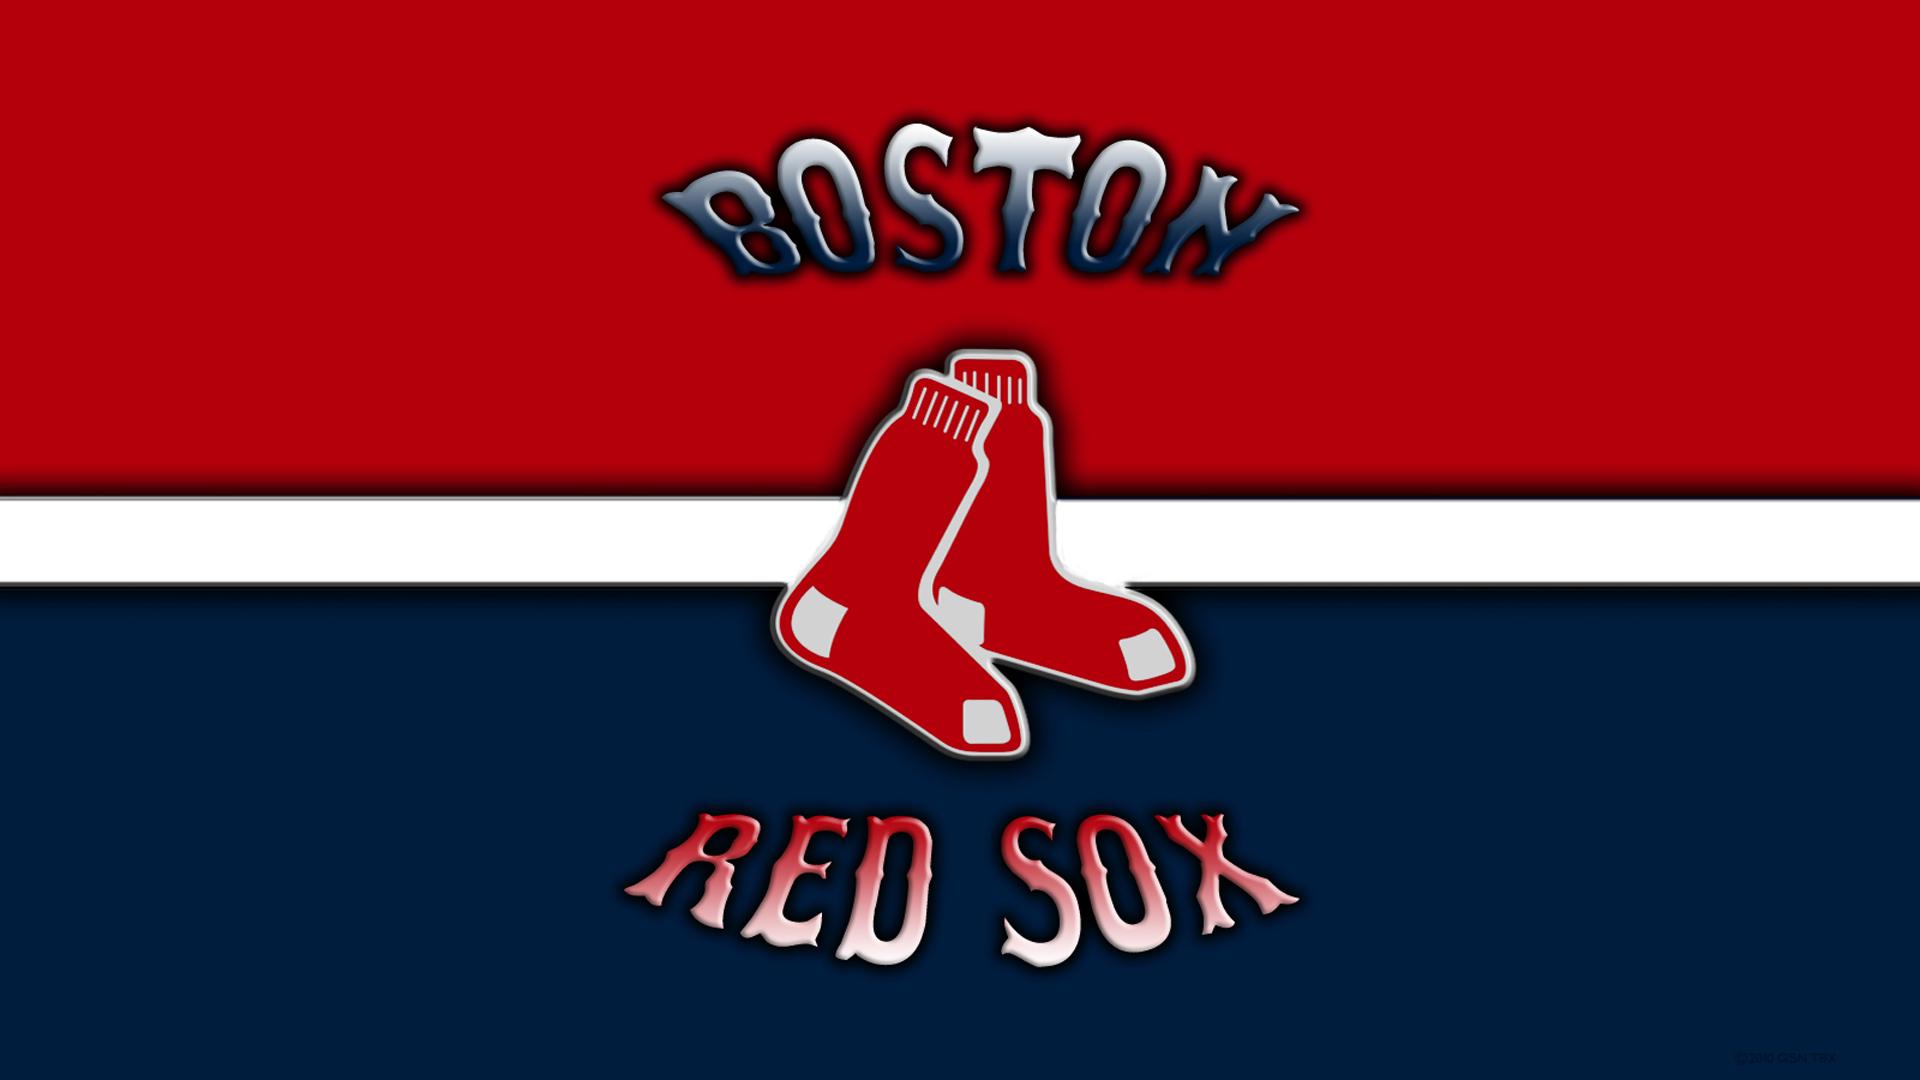 BOSTON RED SOX baseball mlb g wallpaper background 1920x1080